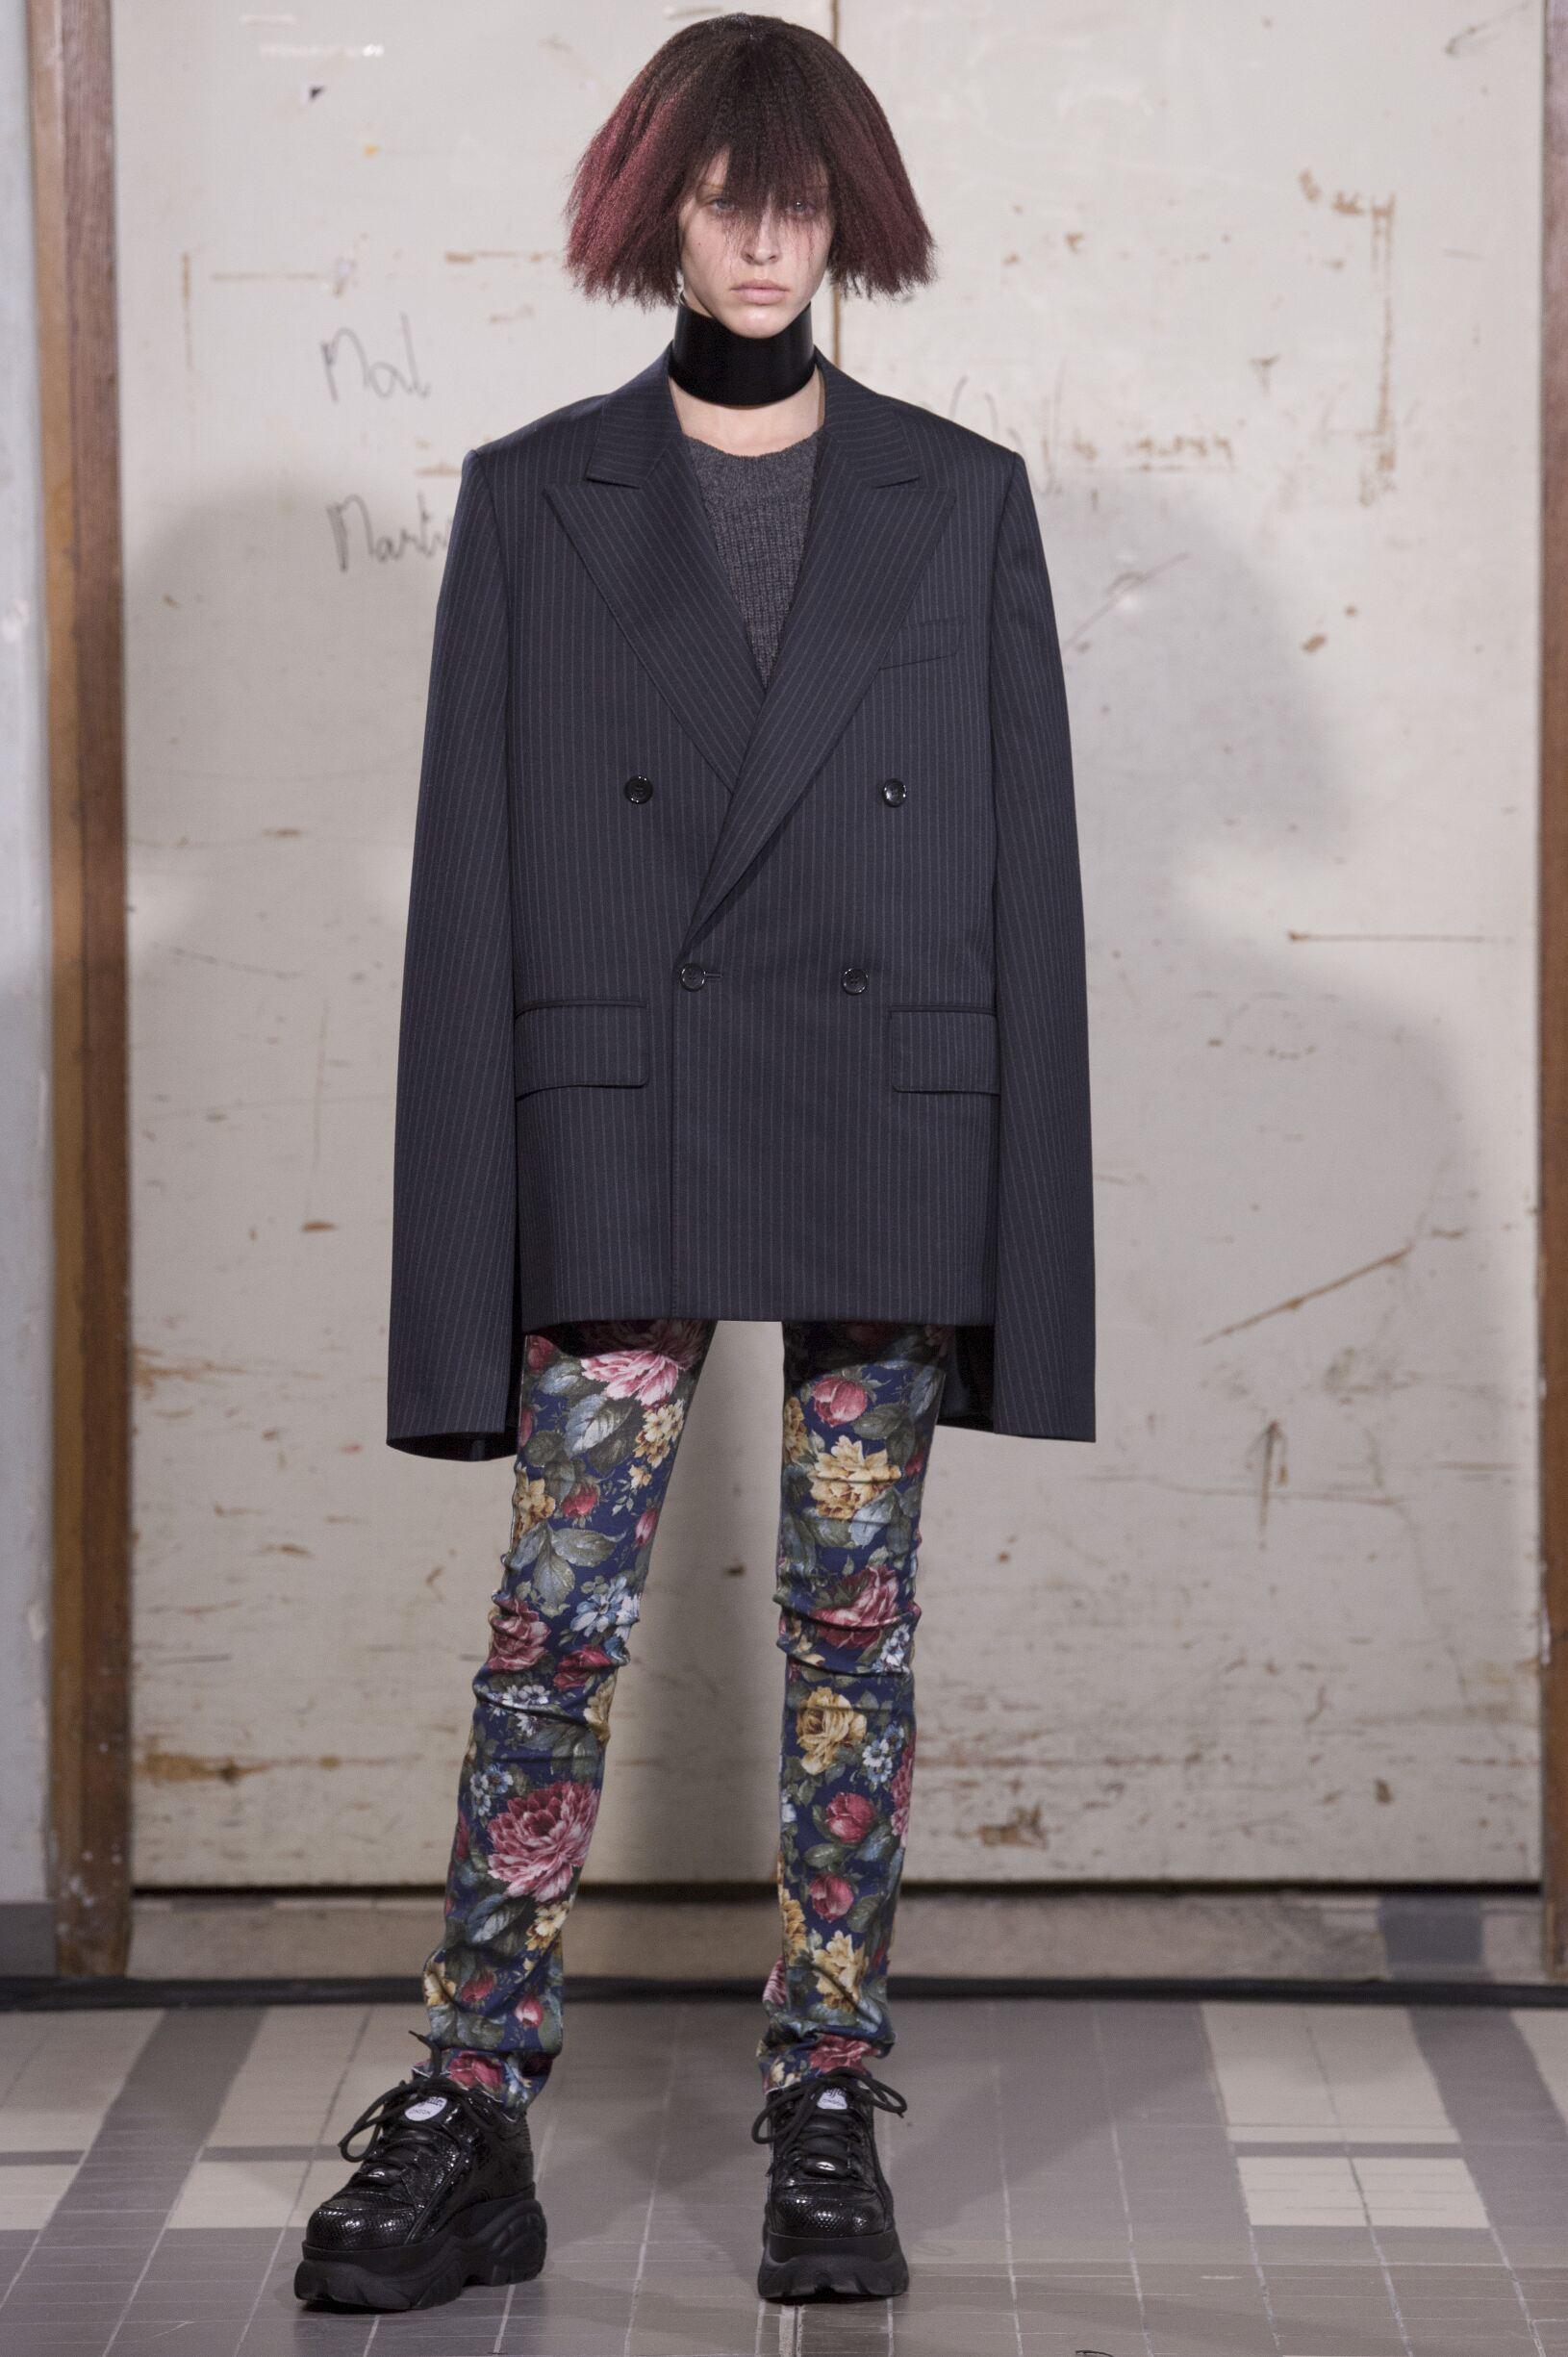 FW 2018 19 Junya Watanabe Fashion Show